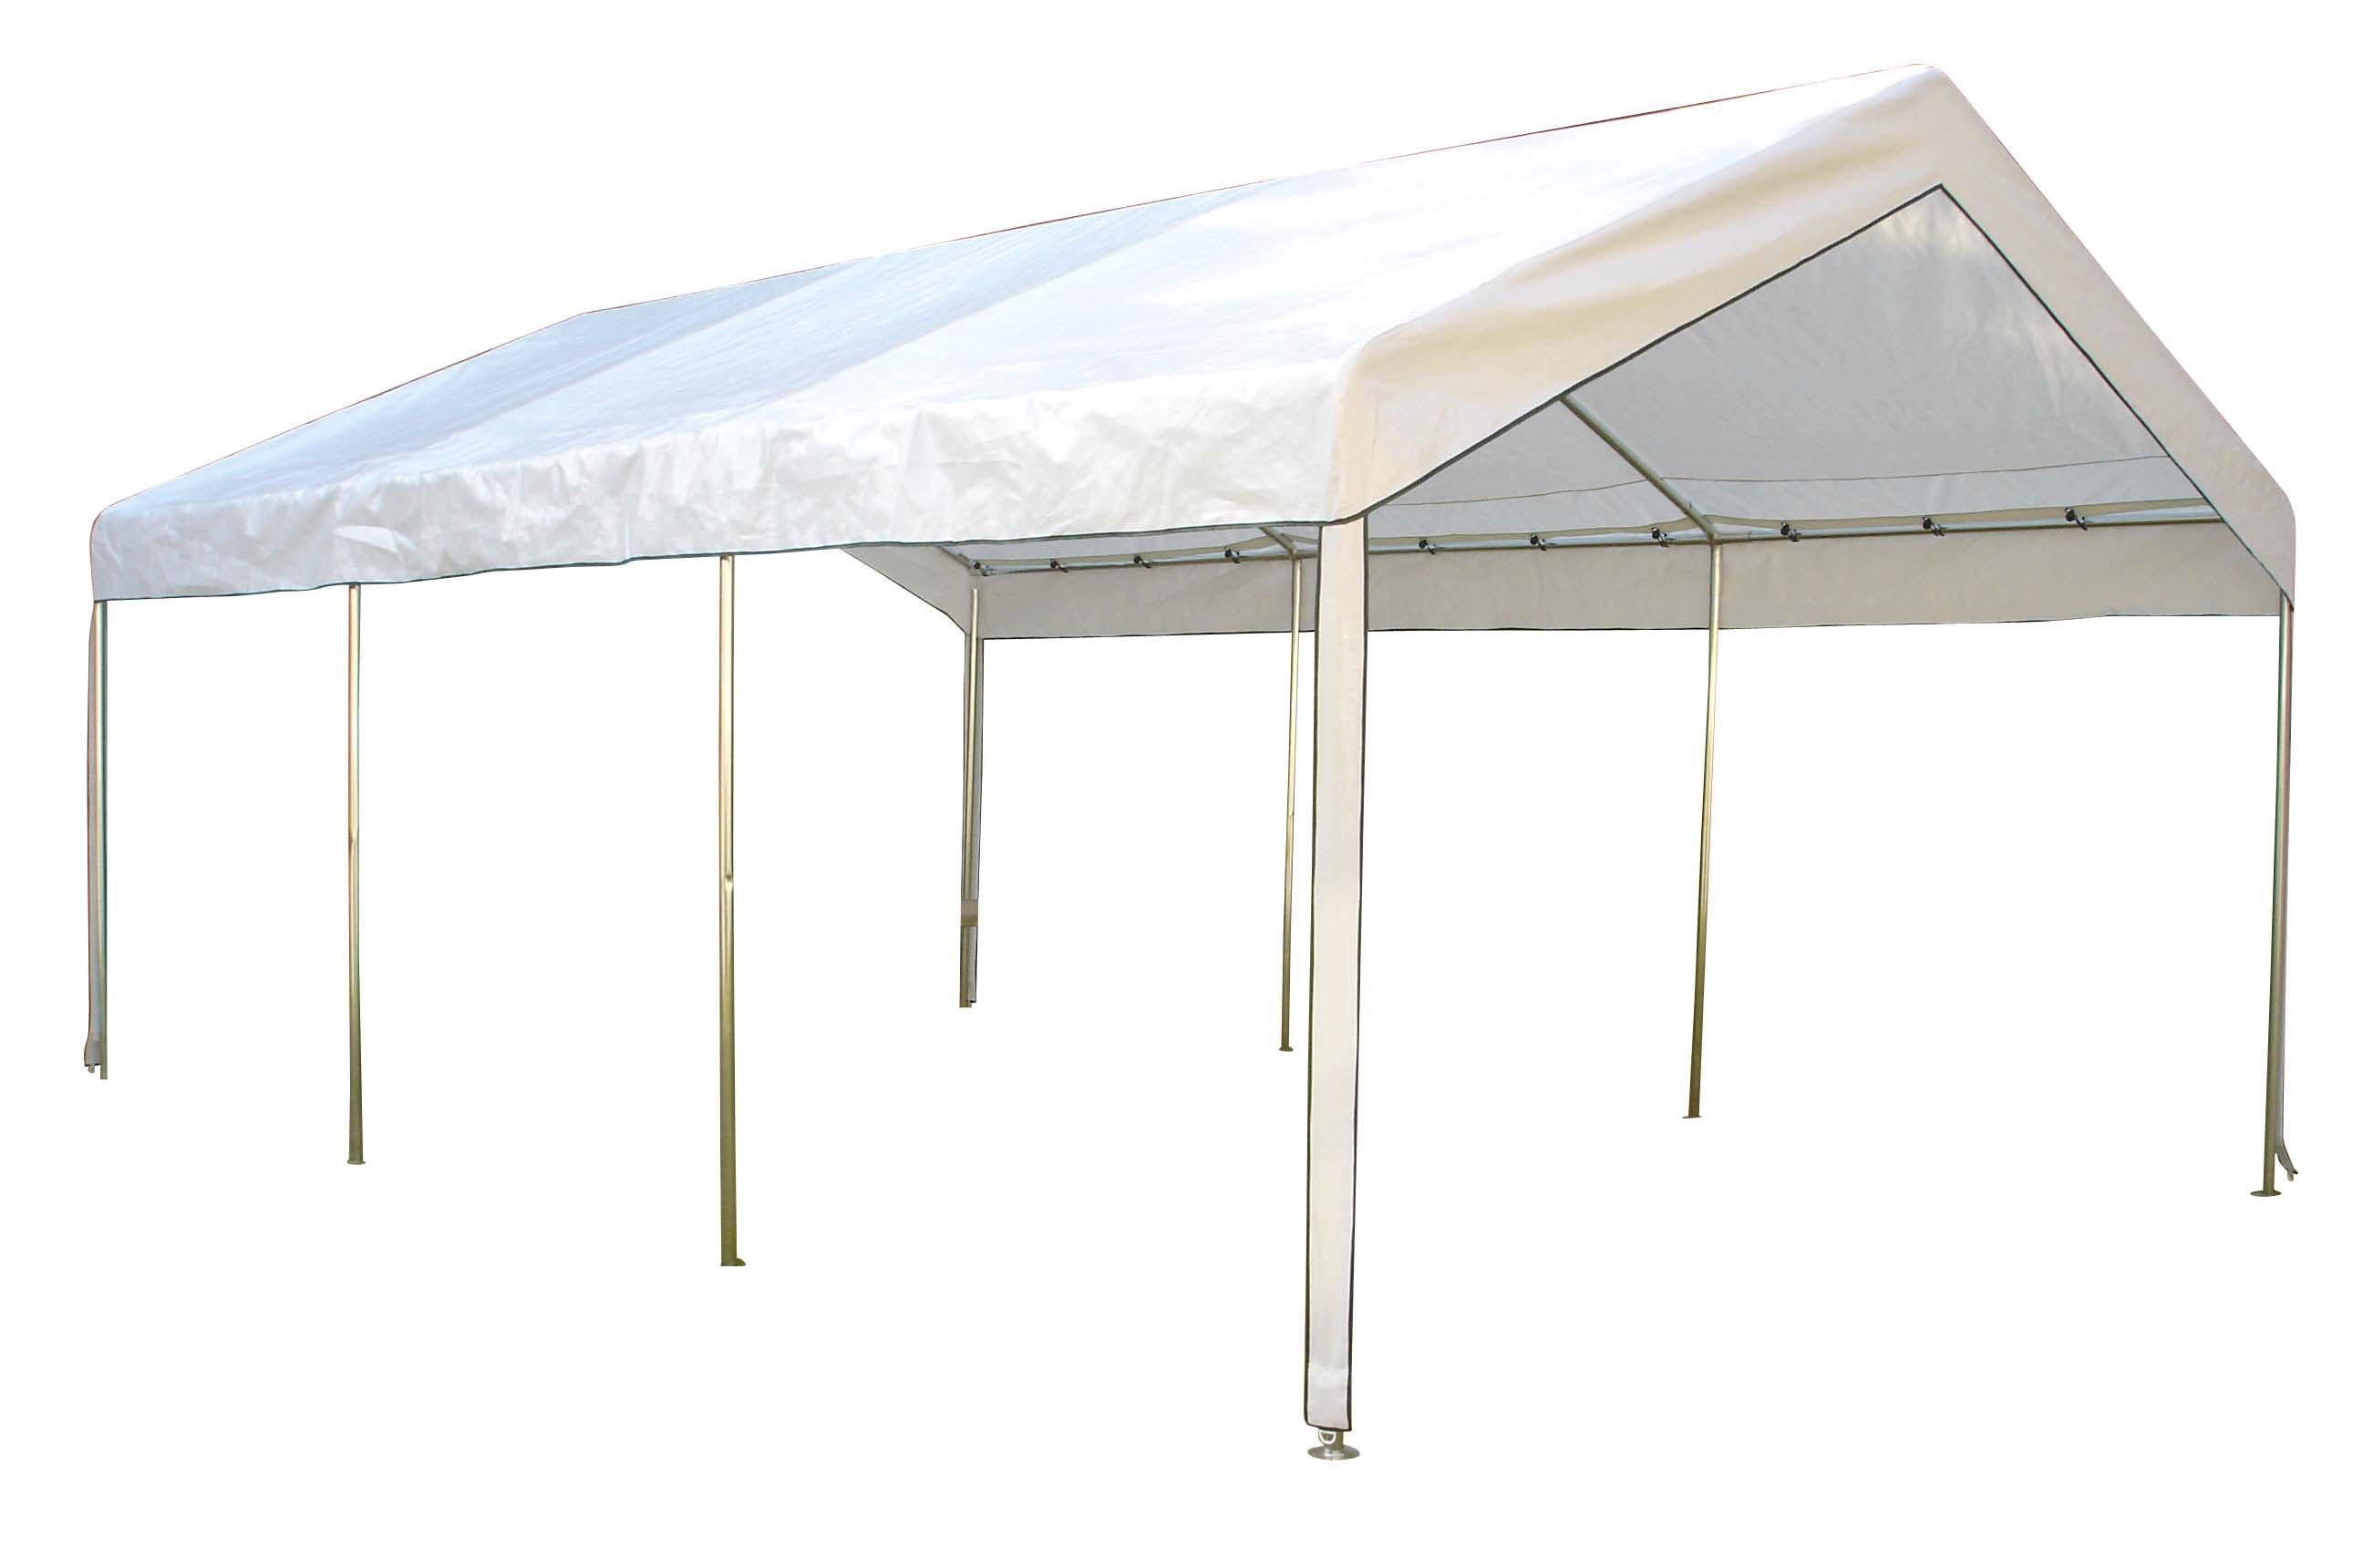 Festzelt / Profi-Partyzelt Stahl / PE-Dach Bellavista 4x6m weiß Bild 1